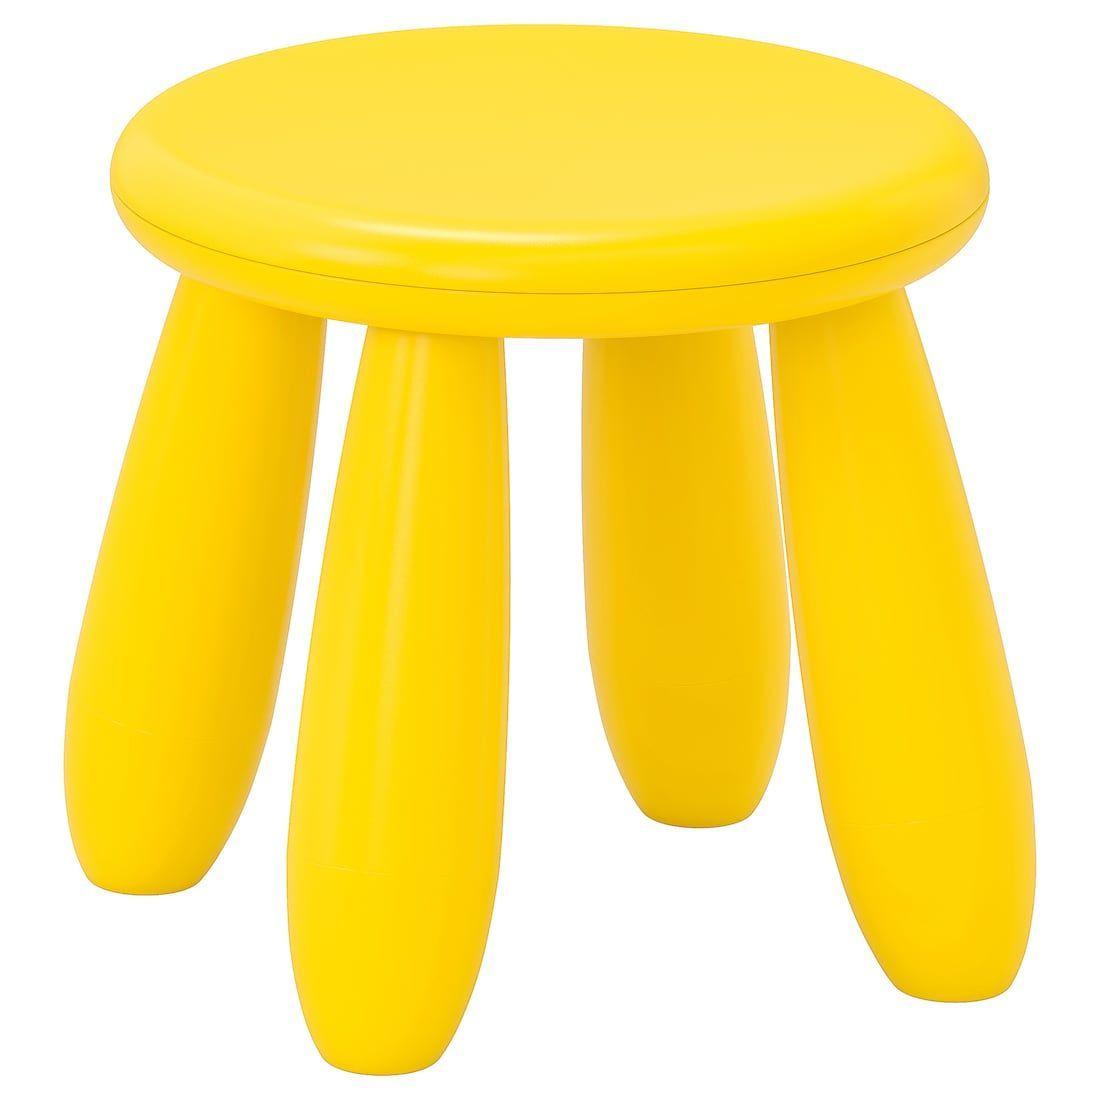 Mammut Kinderhocker Innen Aussen Gelb Ikea Kinder Hocker Kinderhocker Kinder Spielzimmer Mobel